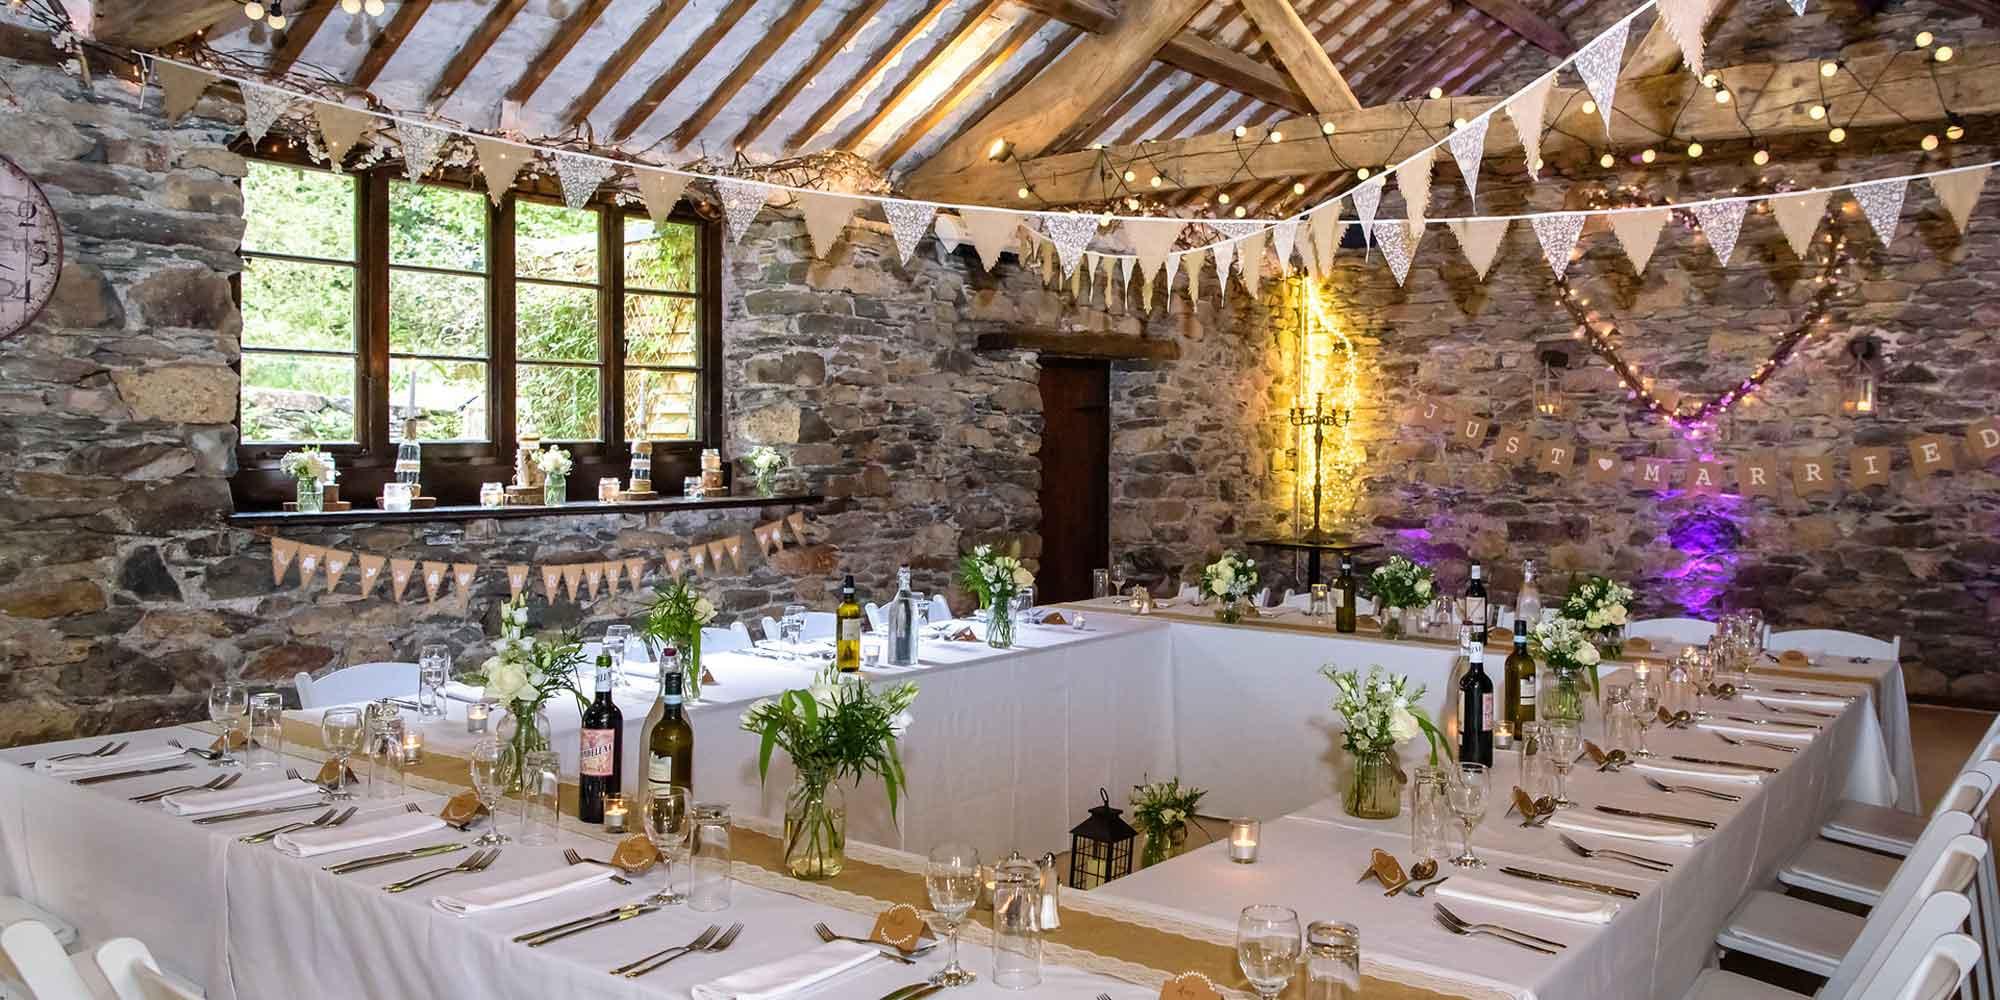 Small wedding breakfast in the barn